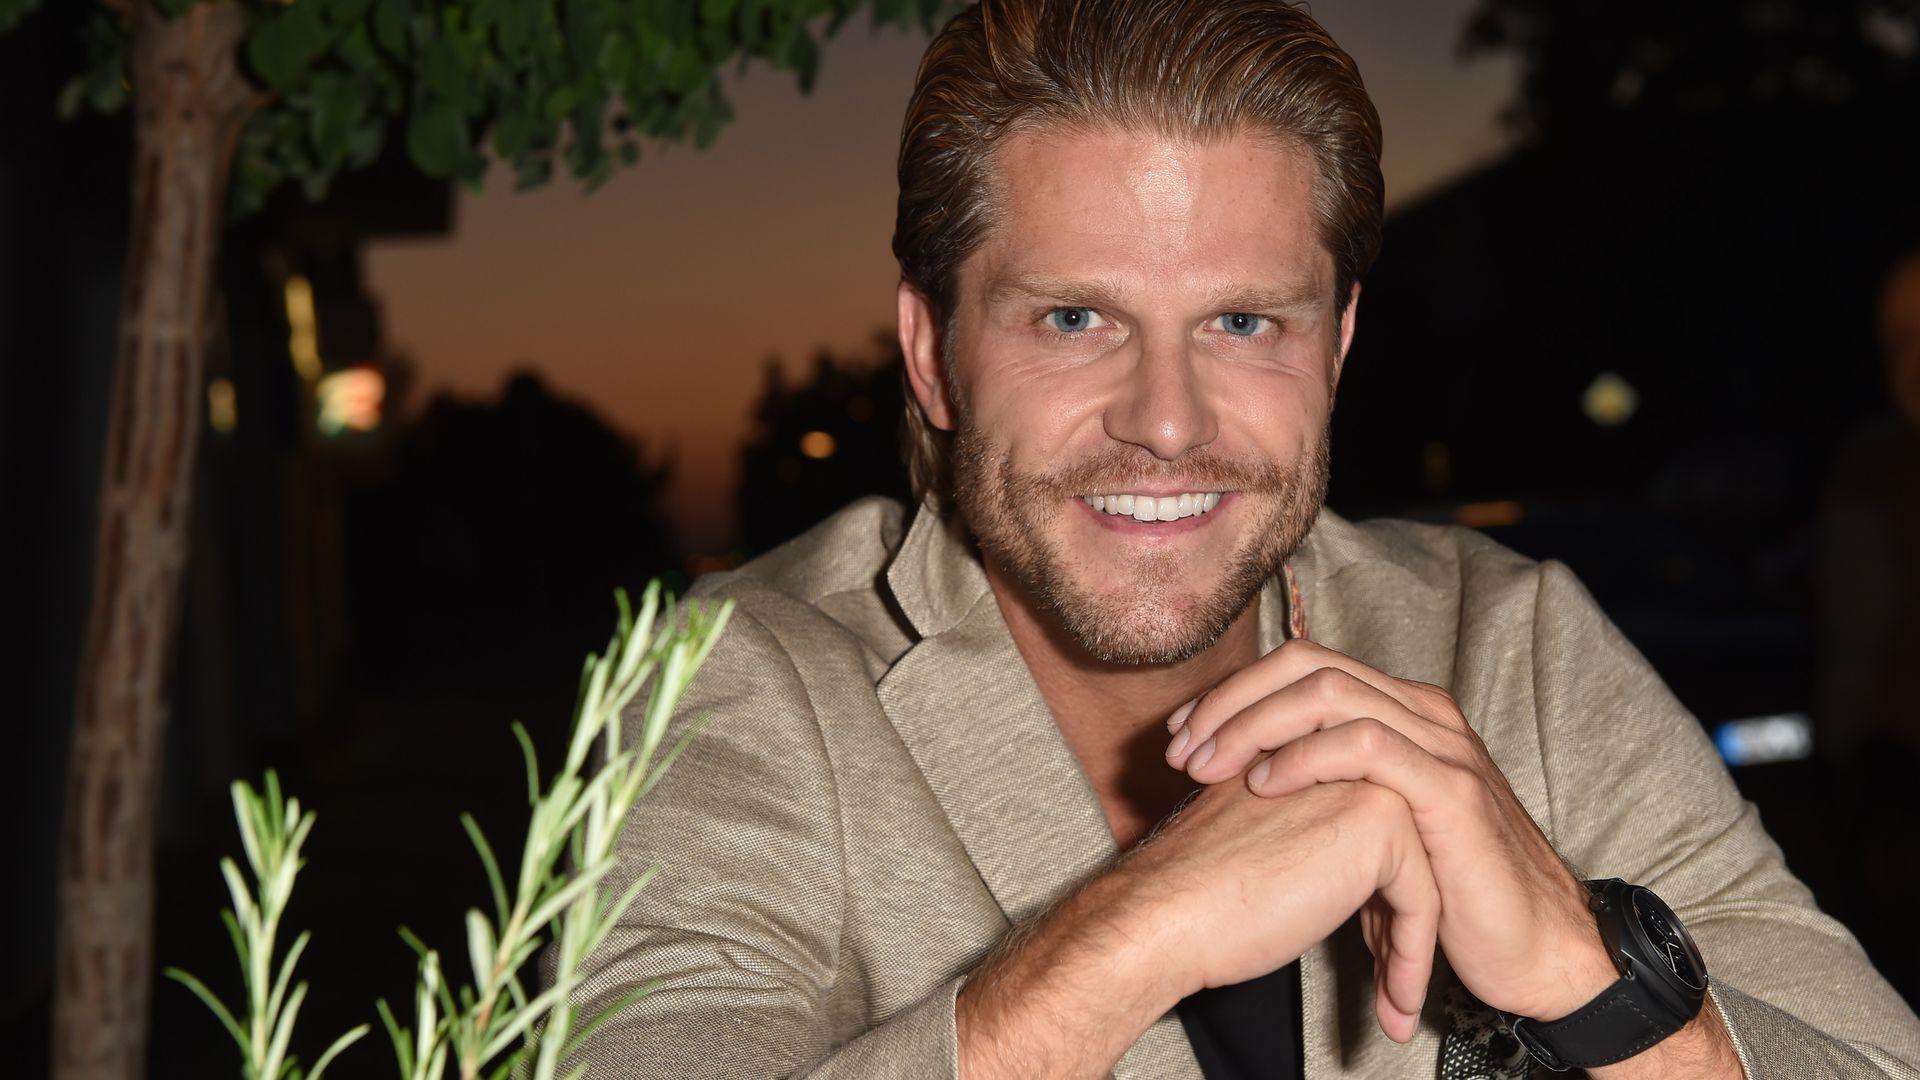 Single oder liiert? Ex-Bachelor Paul Janke spricht